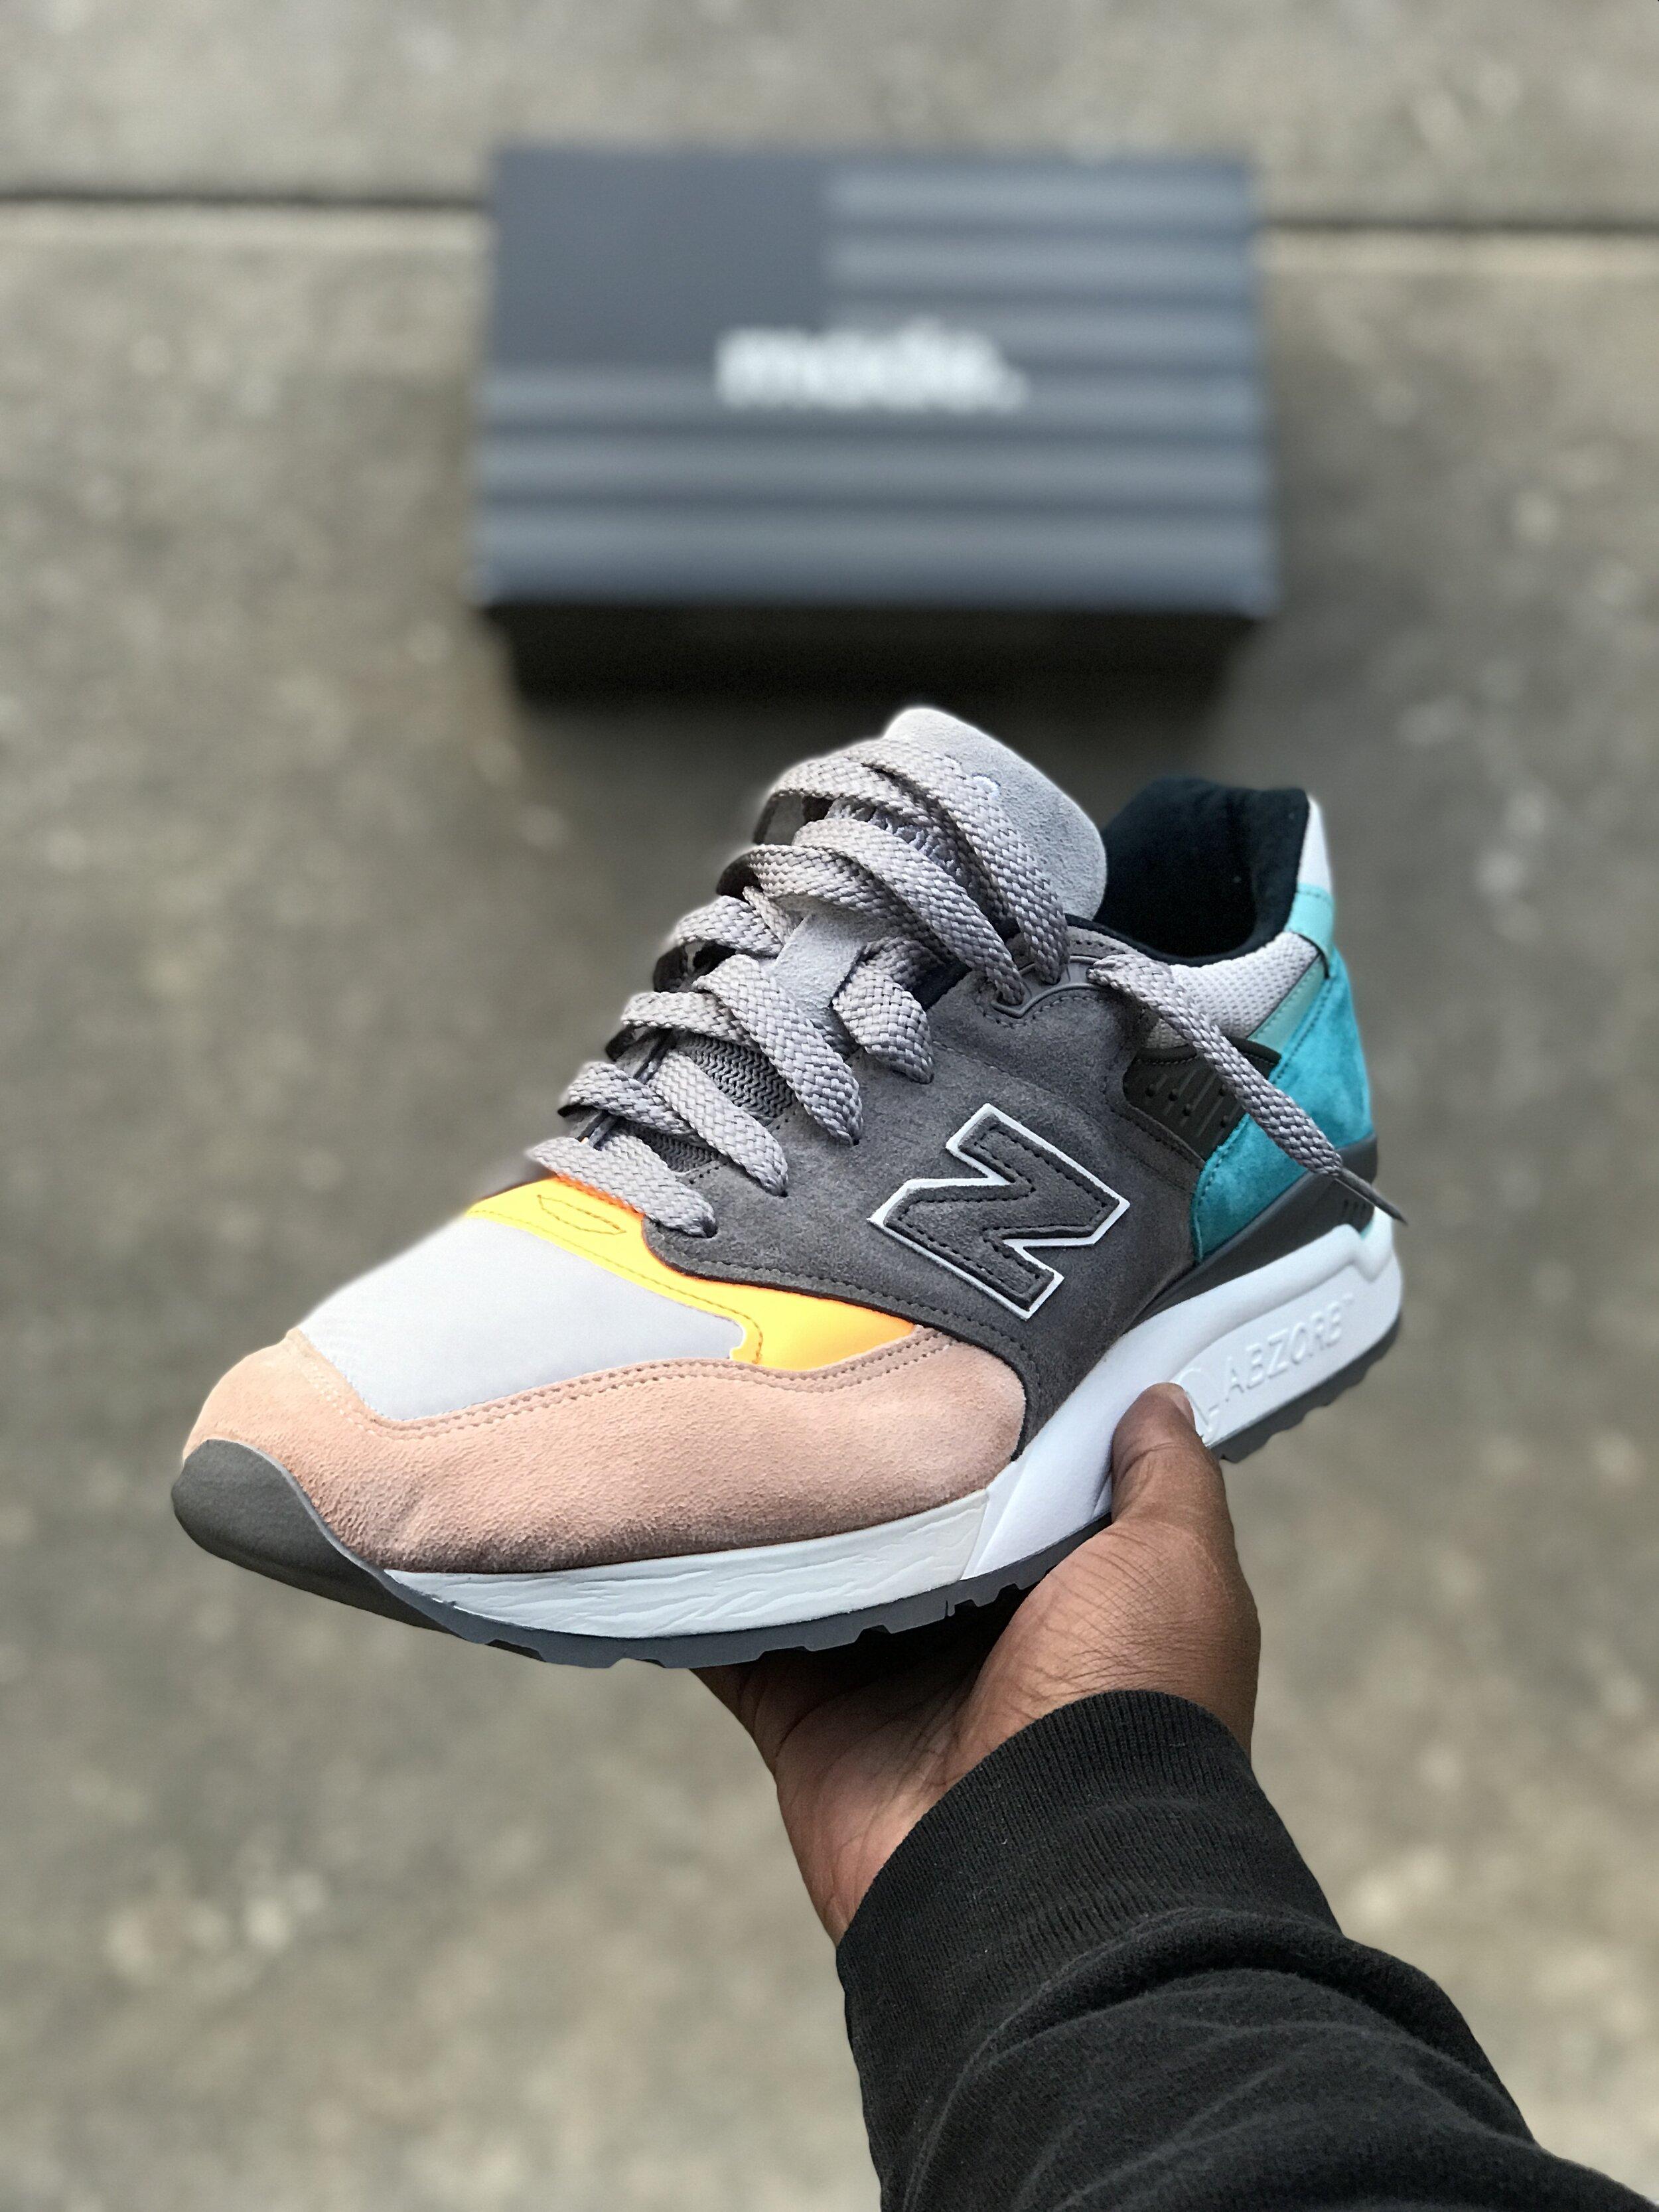 The New Balance 998